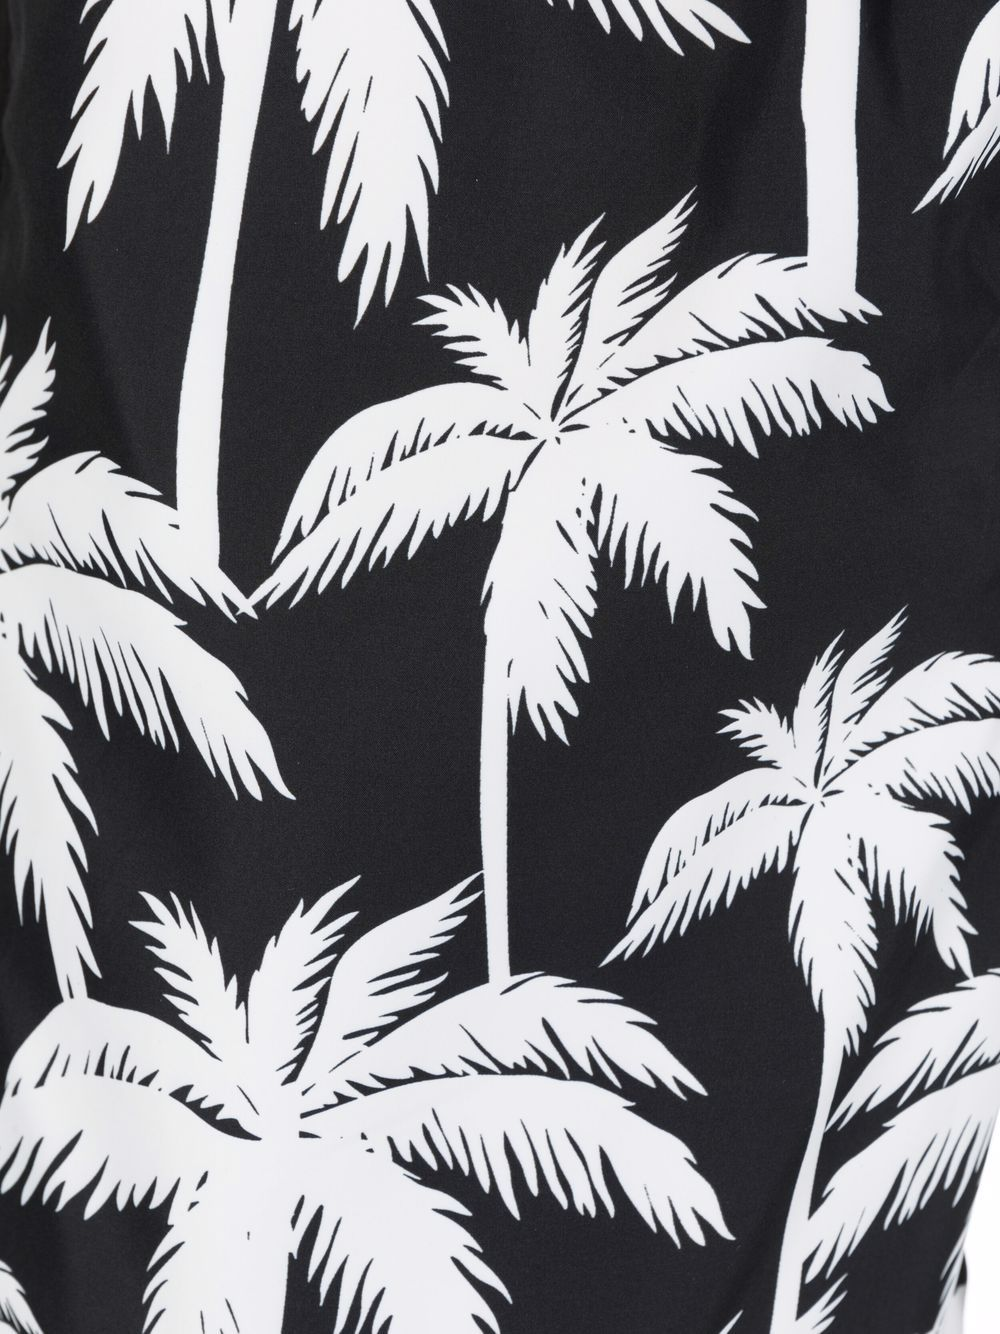 Black and white recycled polyester  swim shorts featuring palm tree print MC2 |  | LIGHTING SUBMARINE-PALMERA0001